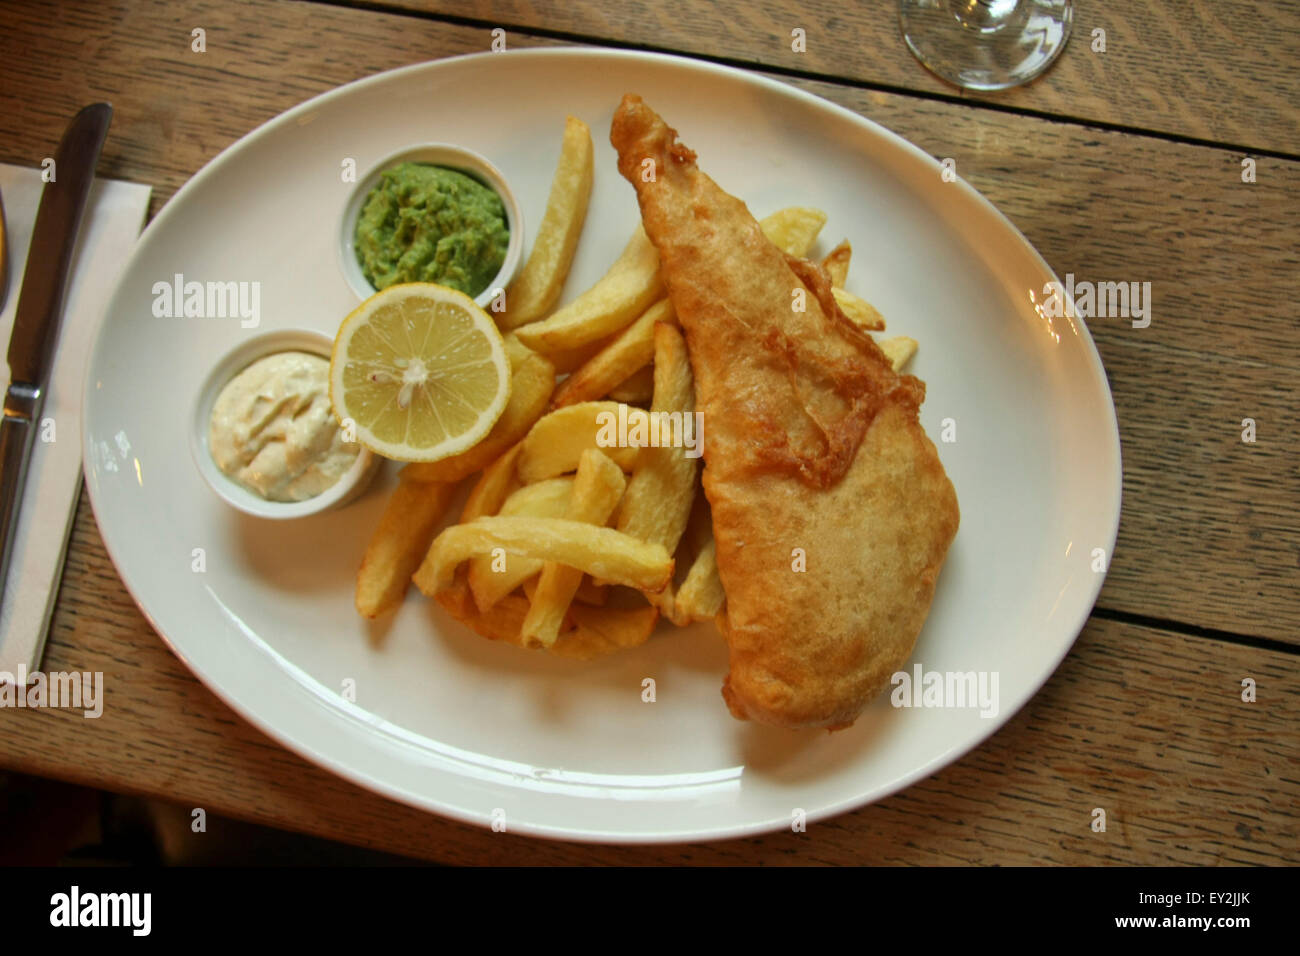 Fish & Chips inglés tradicional con puré de guisantes y salsa tártara. Imagen De Stock